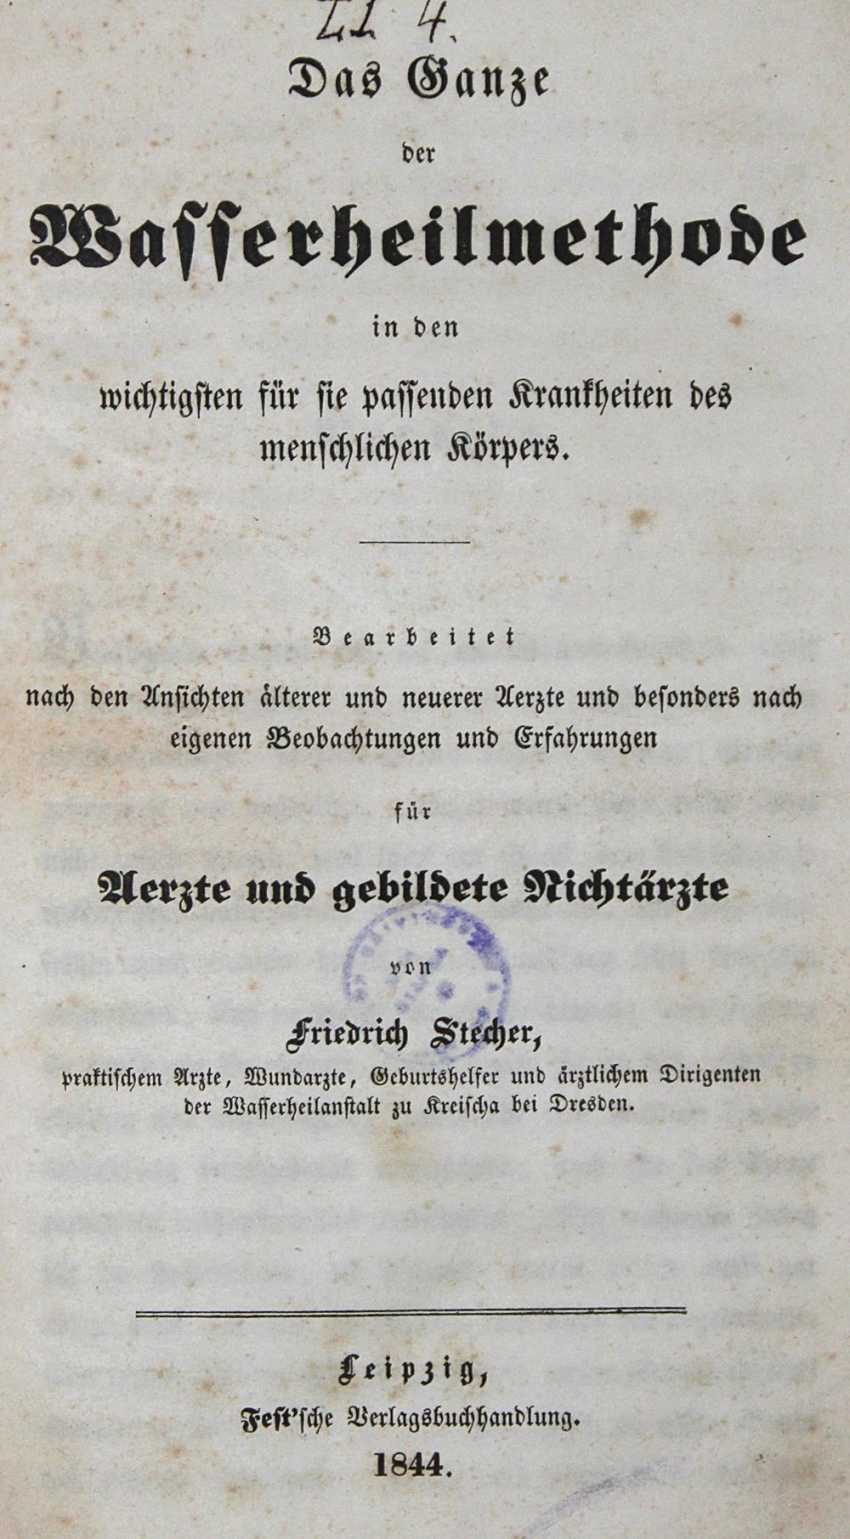 Stecher, F. - photo 1